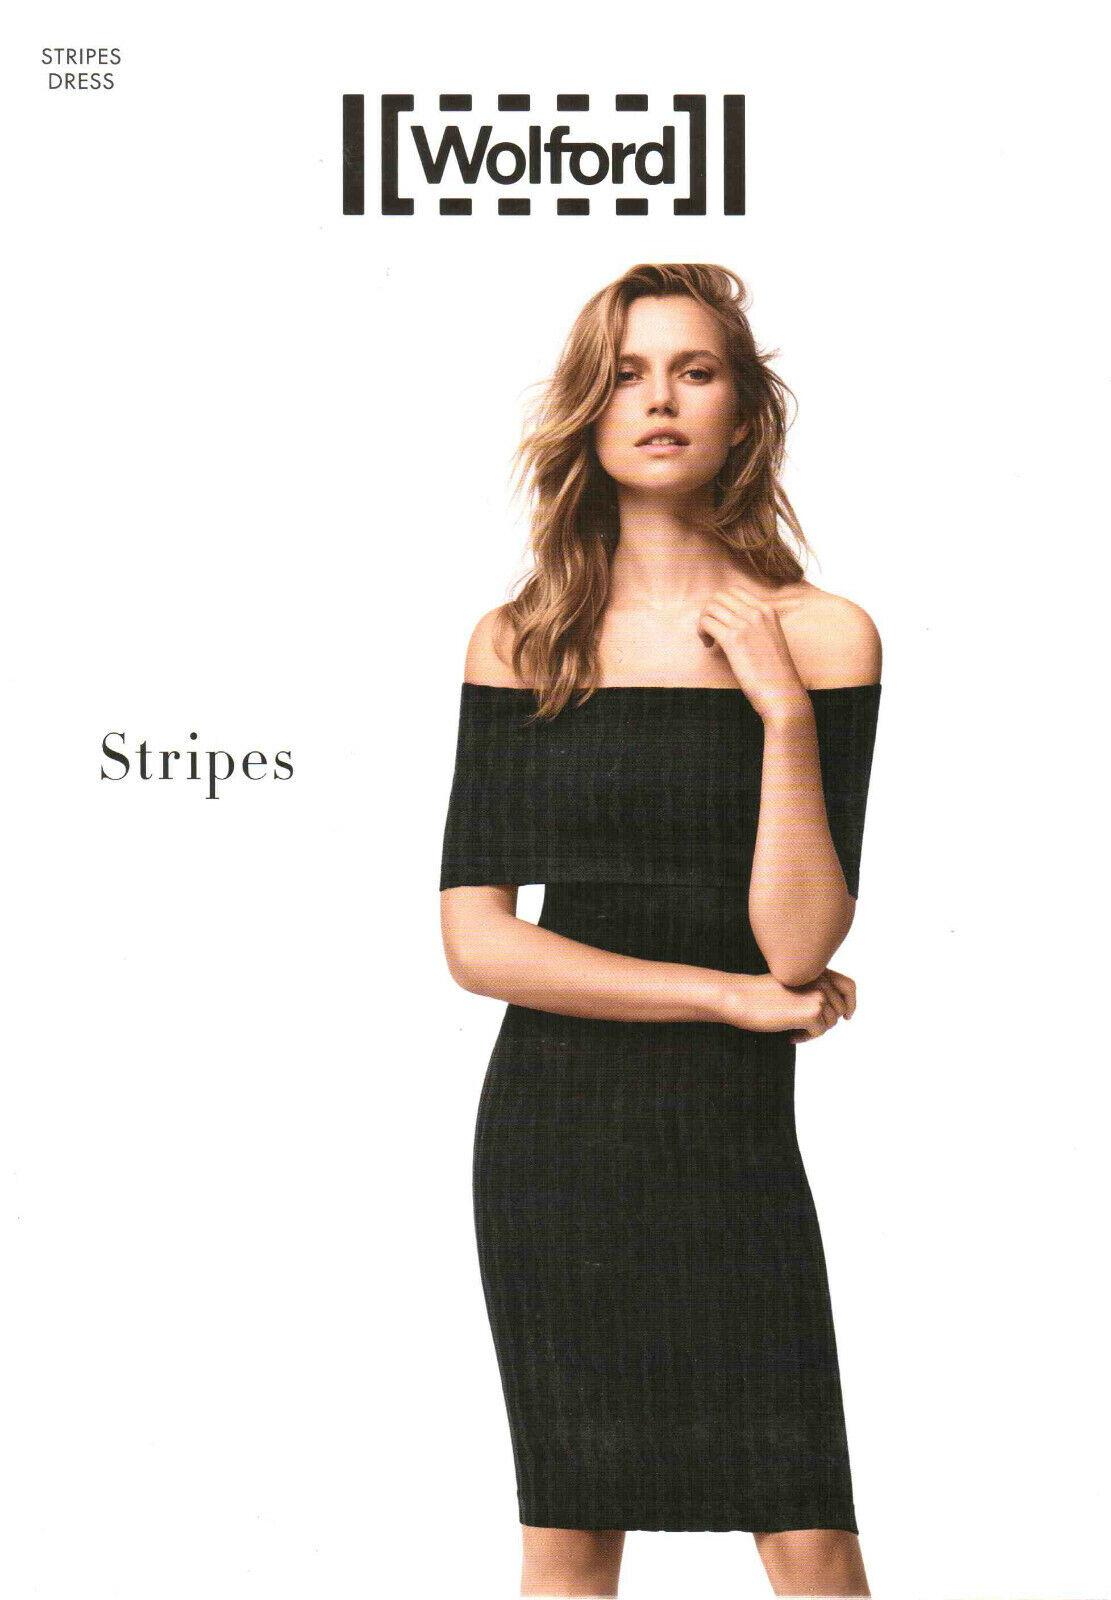 LUXUS PUR  WOLFORD Dress STRIPES (56189), S, schwarz-grau, NEU&OVP, 275,00 Euro